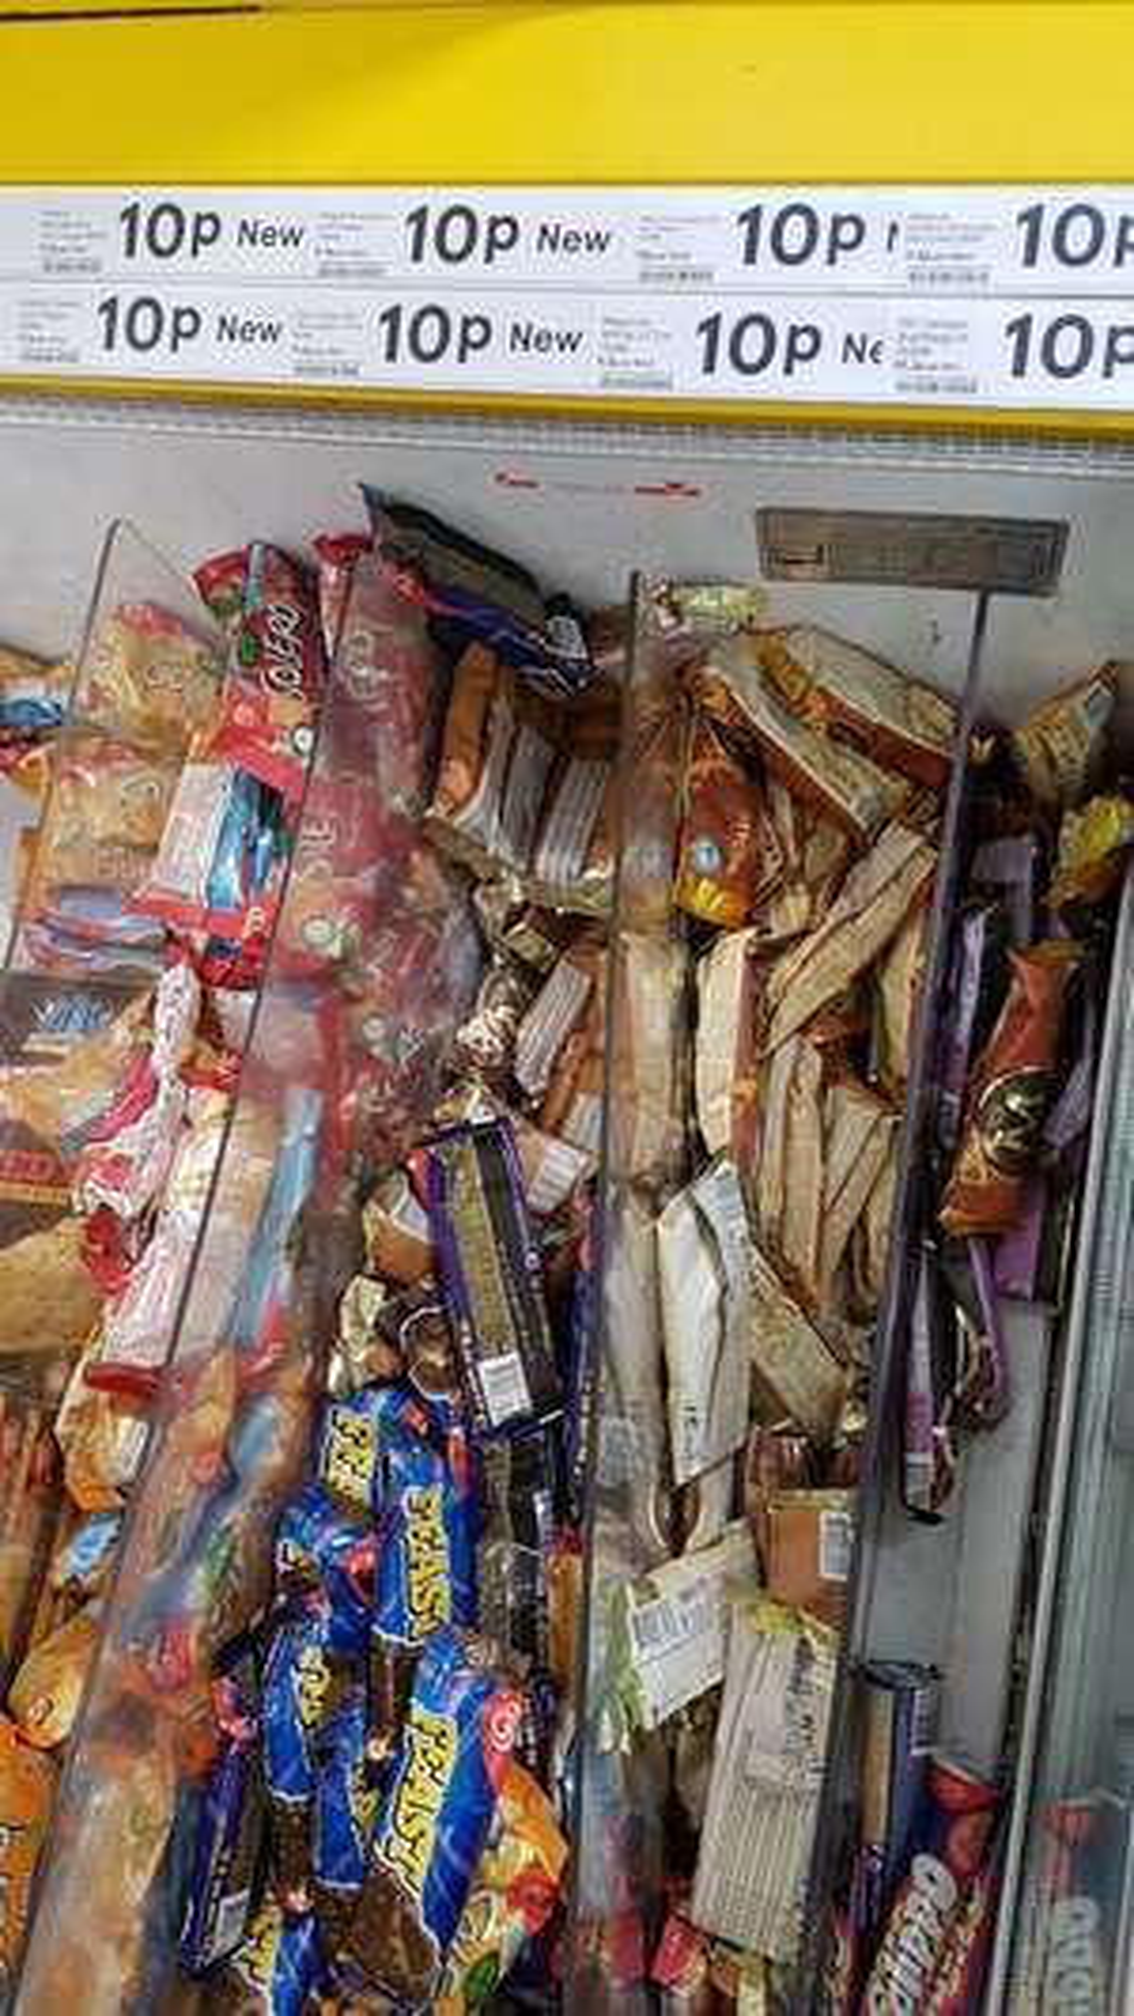 Single Ice creams 10p - tesco in store